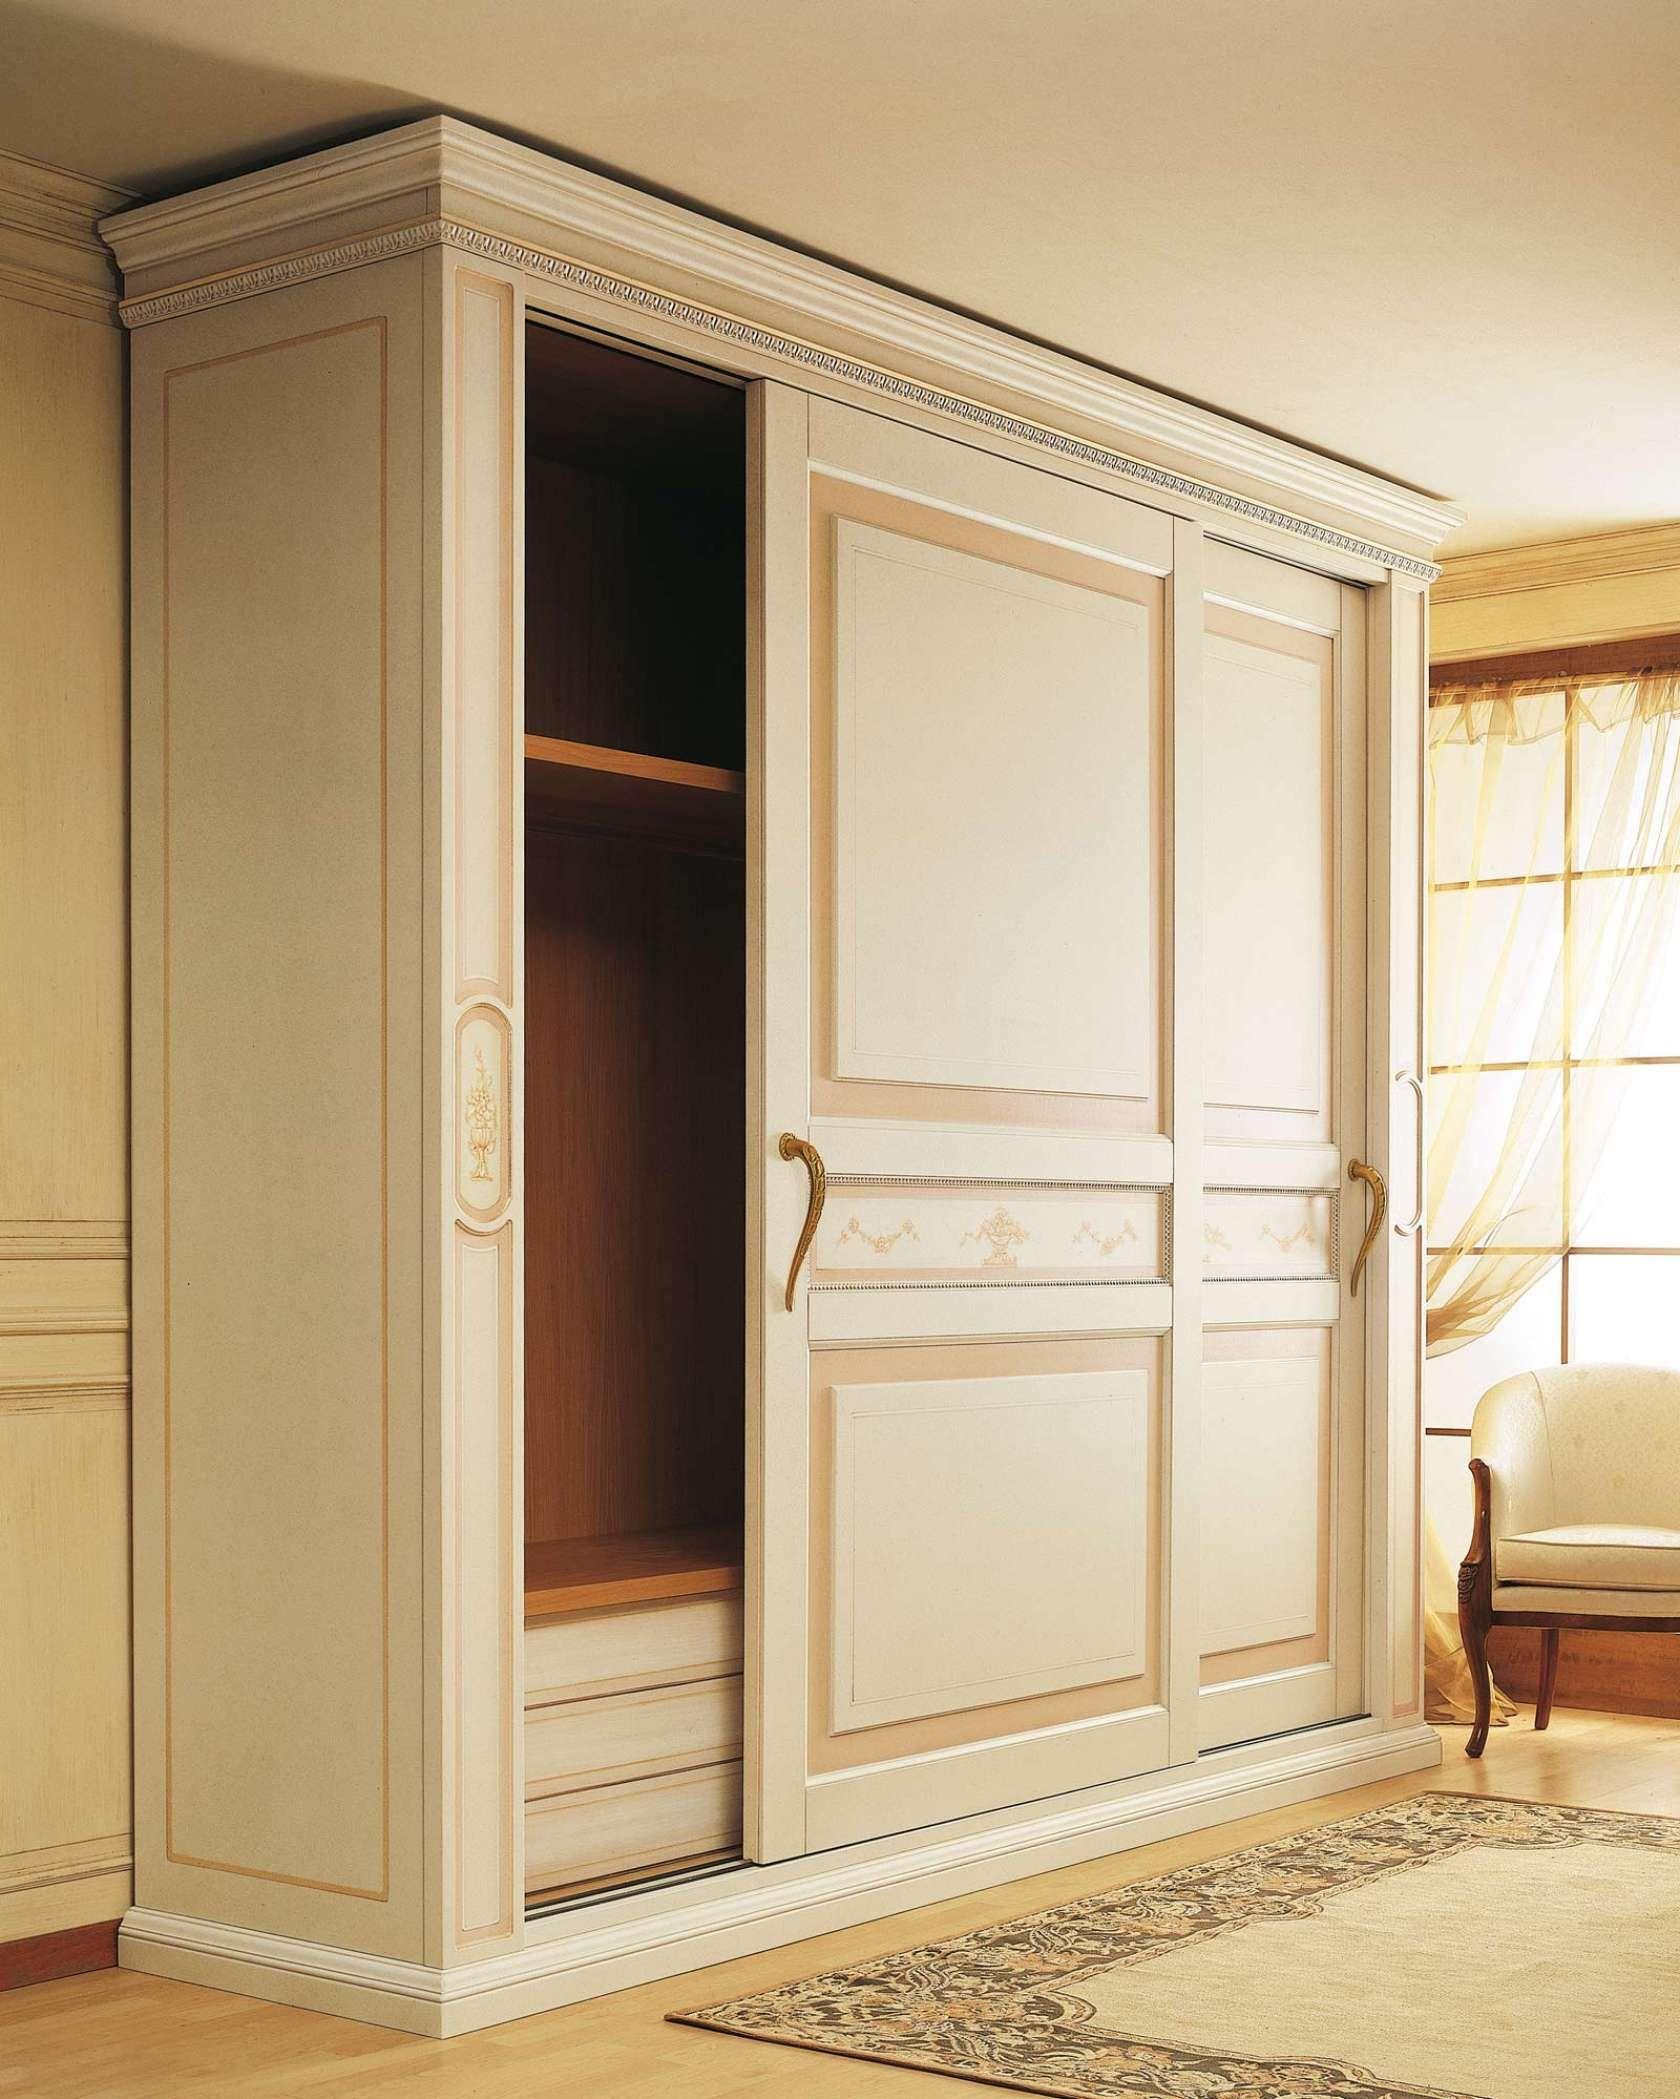 Classic Wardrobe Canova Sliding Doors Vimercati Classic Furniture Wardrobe Door Designs Wardrobe Furniture Small Space Interior Design